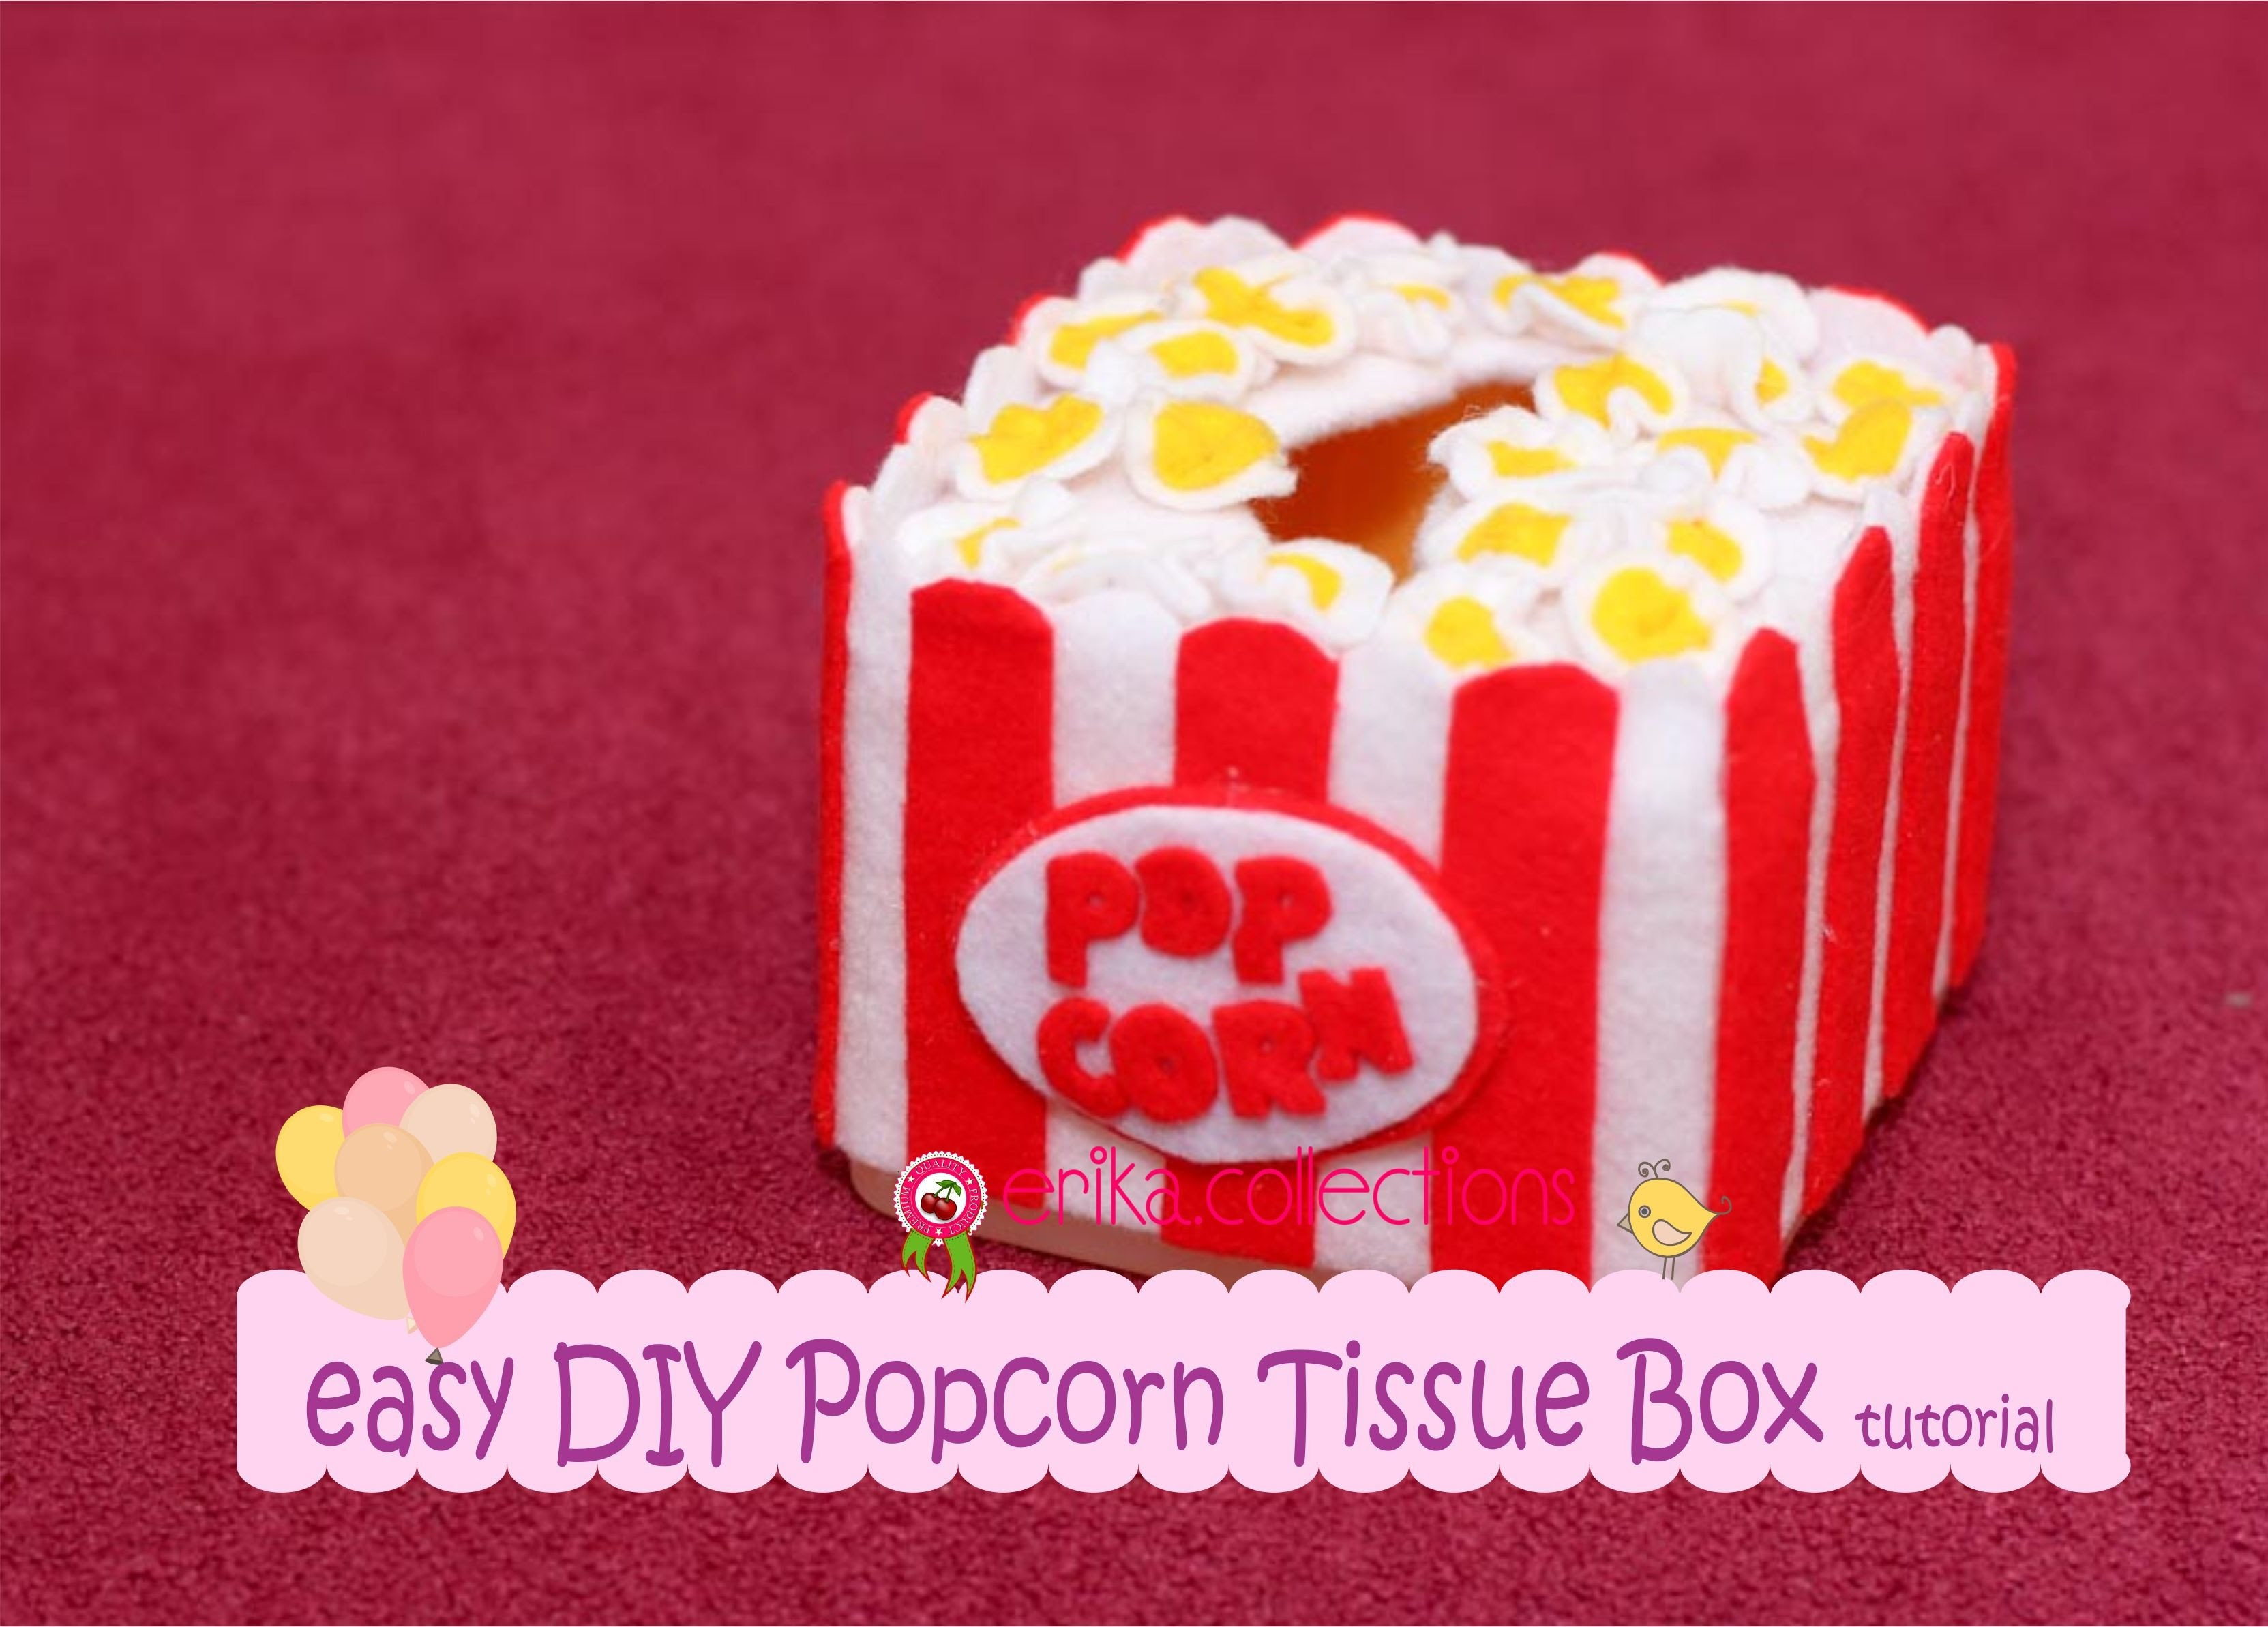 Easy DIY Popcorn tissue box Tutorial - Erika Felt. Flanel Craft